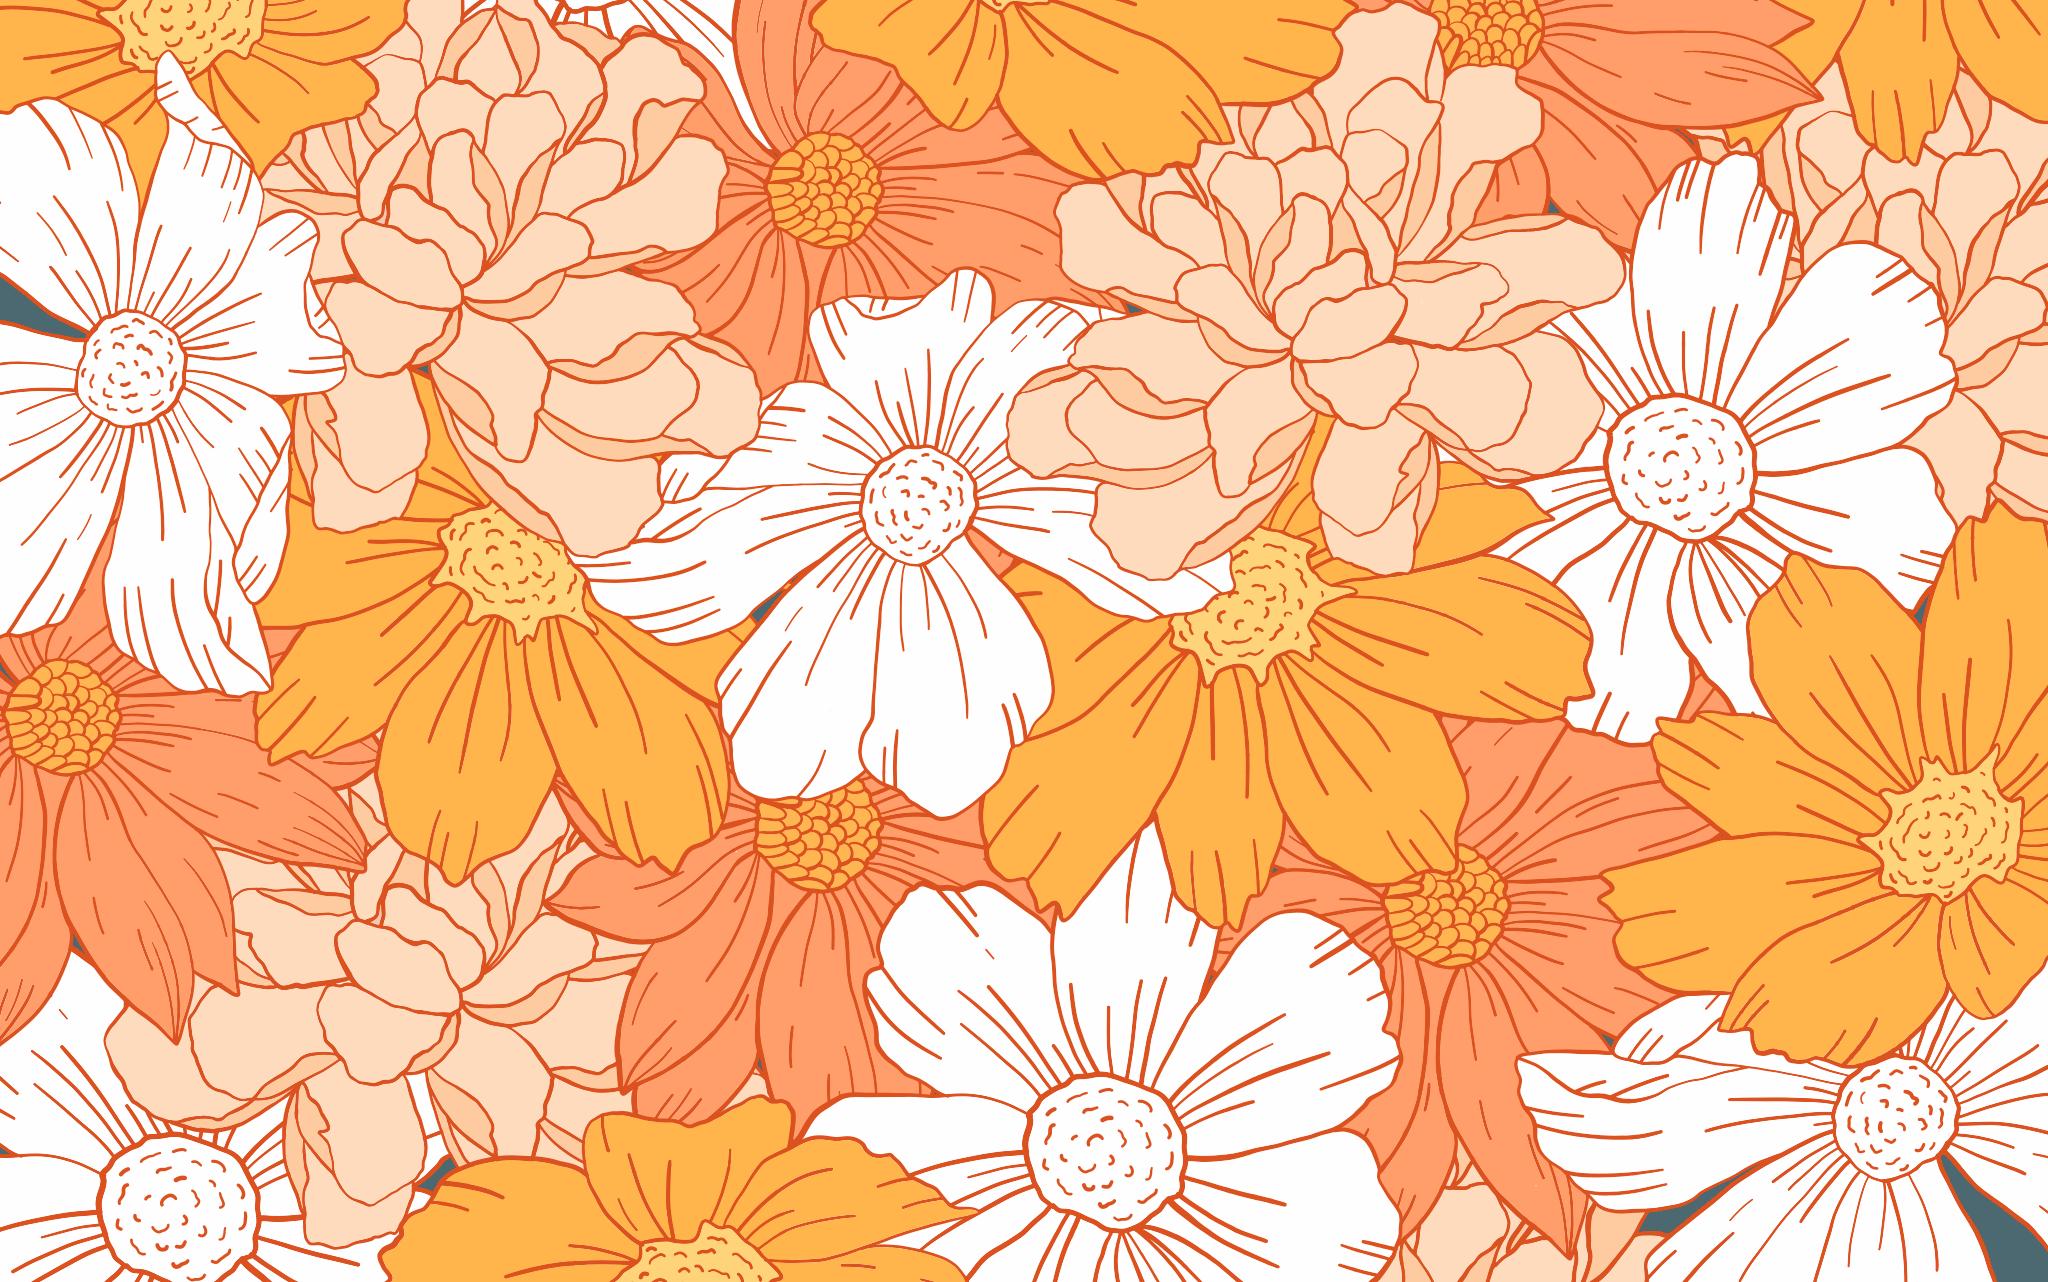 Orange Aesthetic Computer Wallpapers On Wallpaperdog